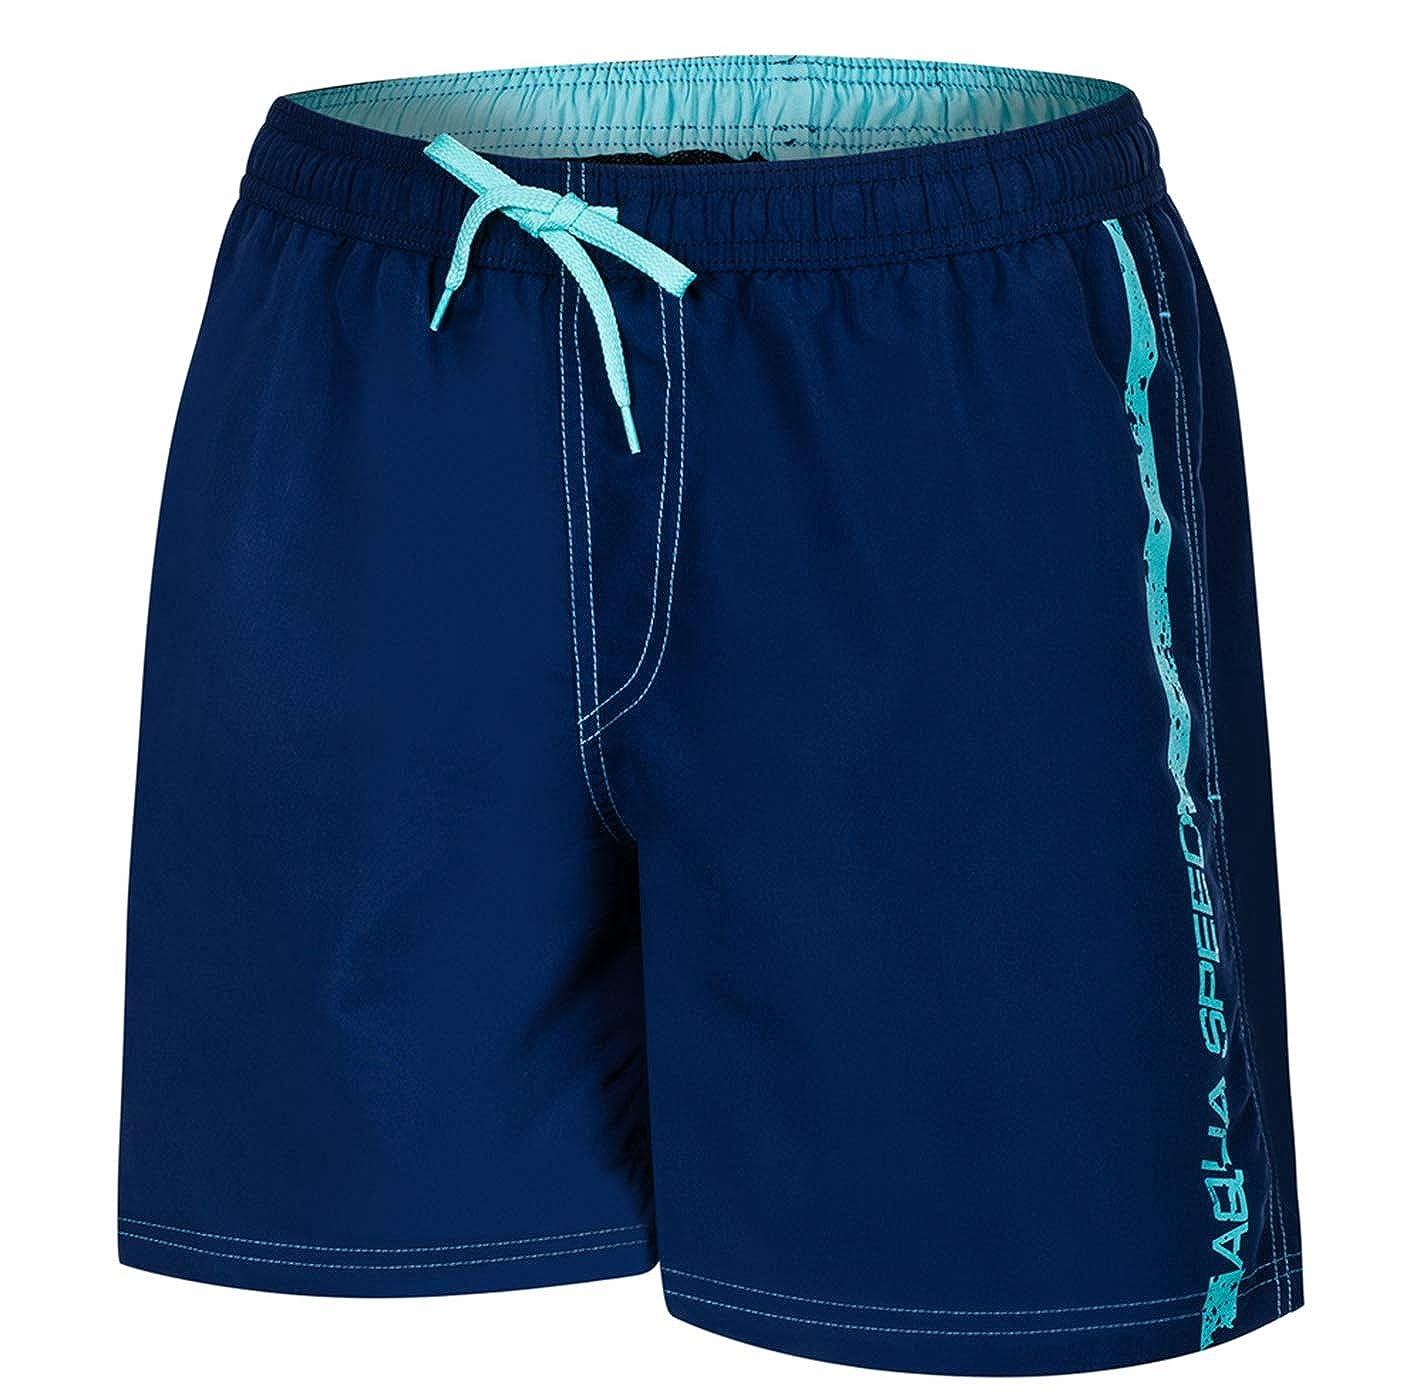 Aqua Speed 5908217667090 Ace Swim - Bañador para Hombre, Talla XXL, Color Azul Marino y Azul